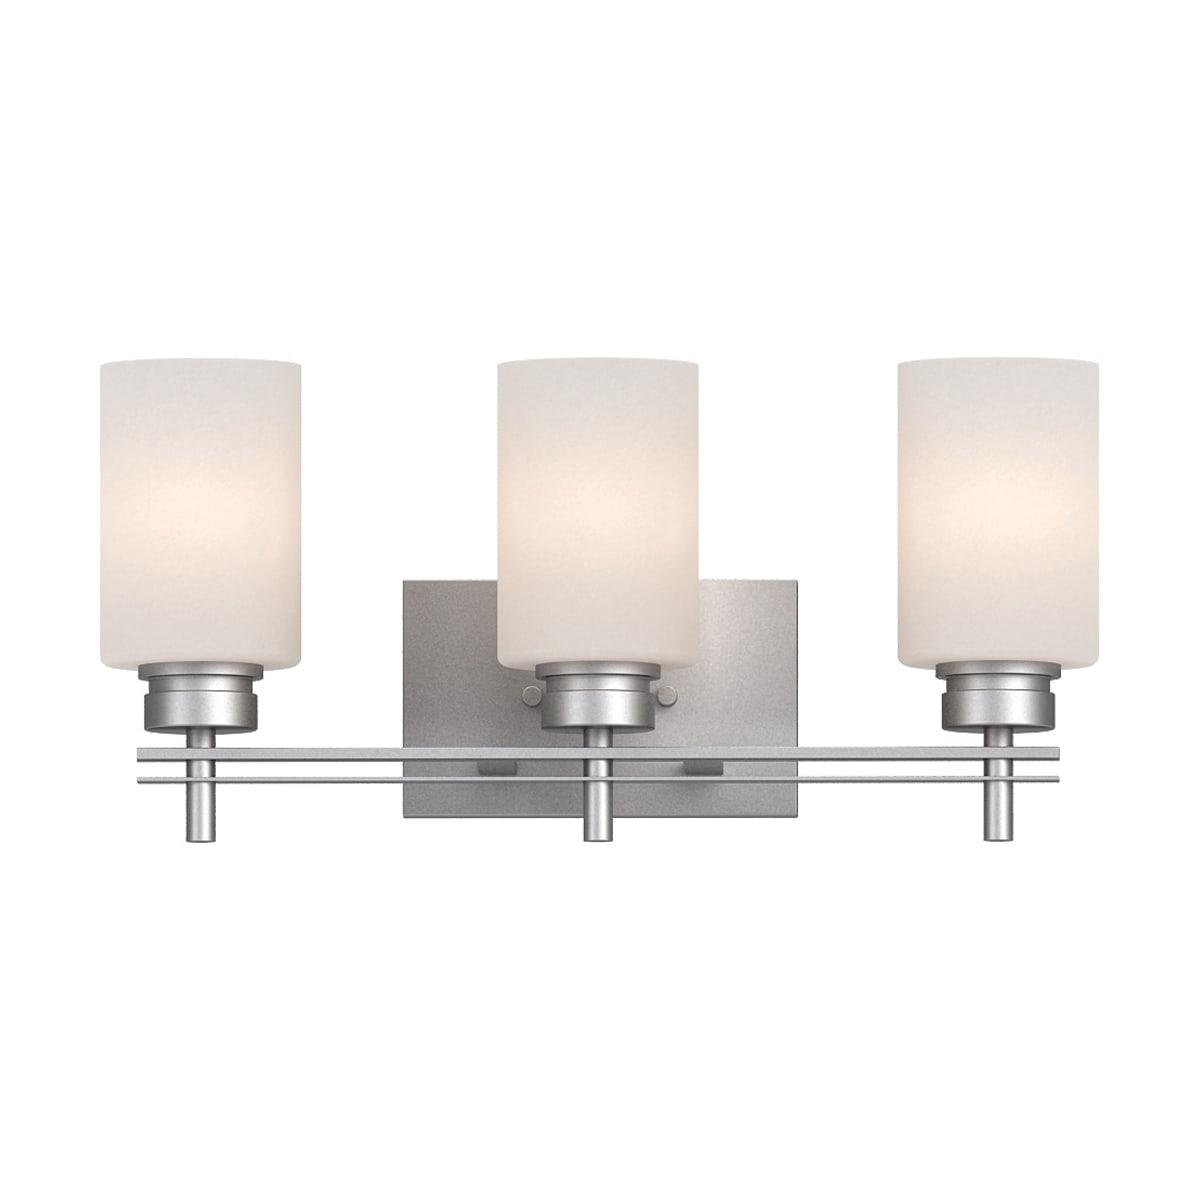 Volume Lighting 3753 62 Nickel Carena 3 Light 20 Wide Bathroom Vanity Light Lightingdirect Com